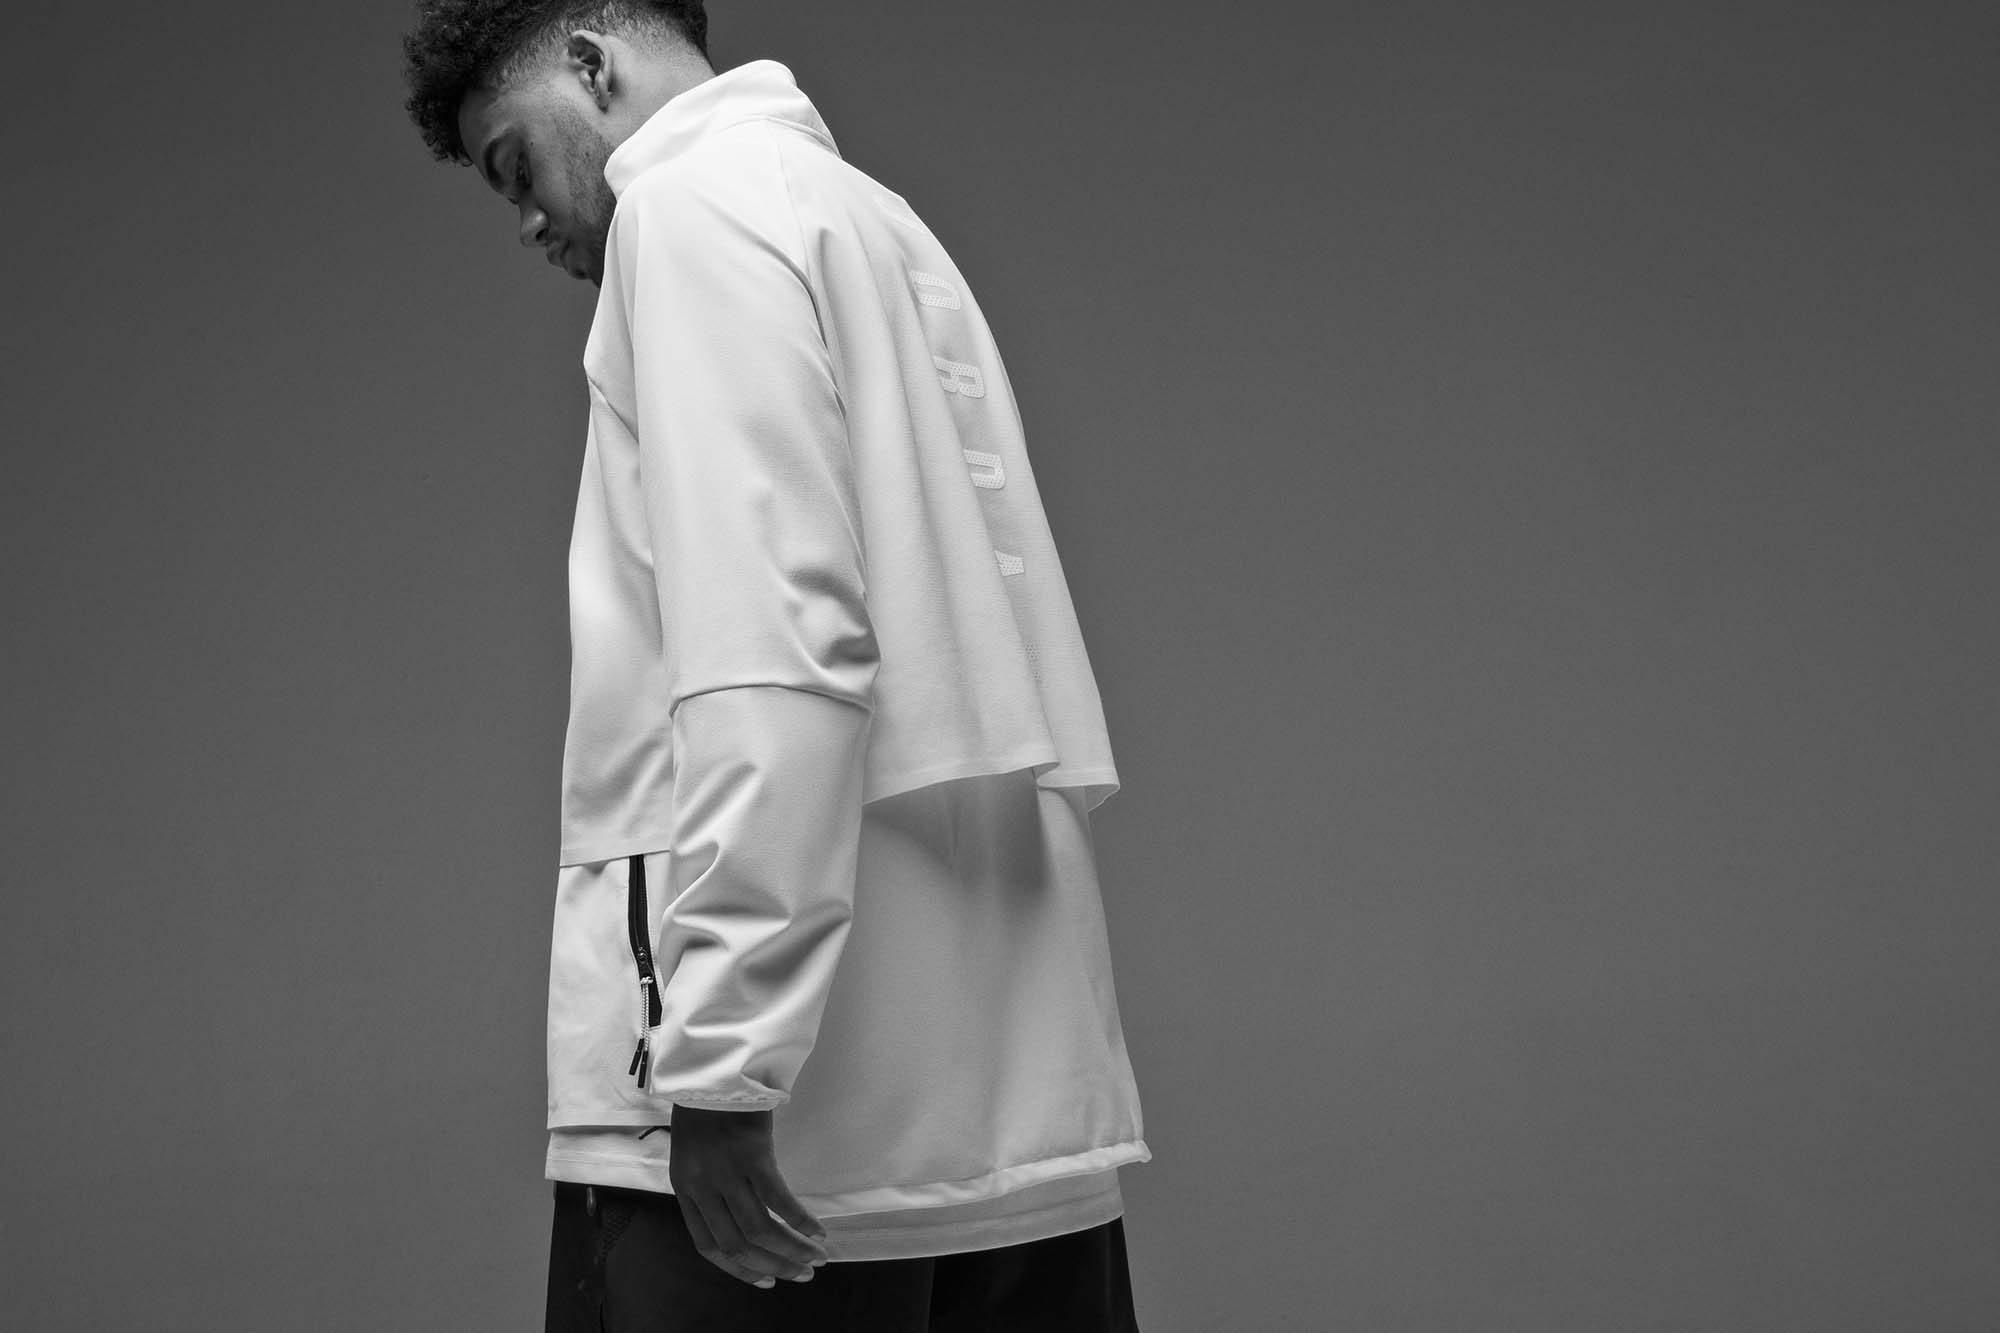 jordan-brand-2017-aw-clothing-collection-003